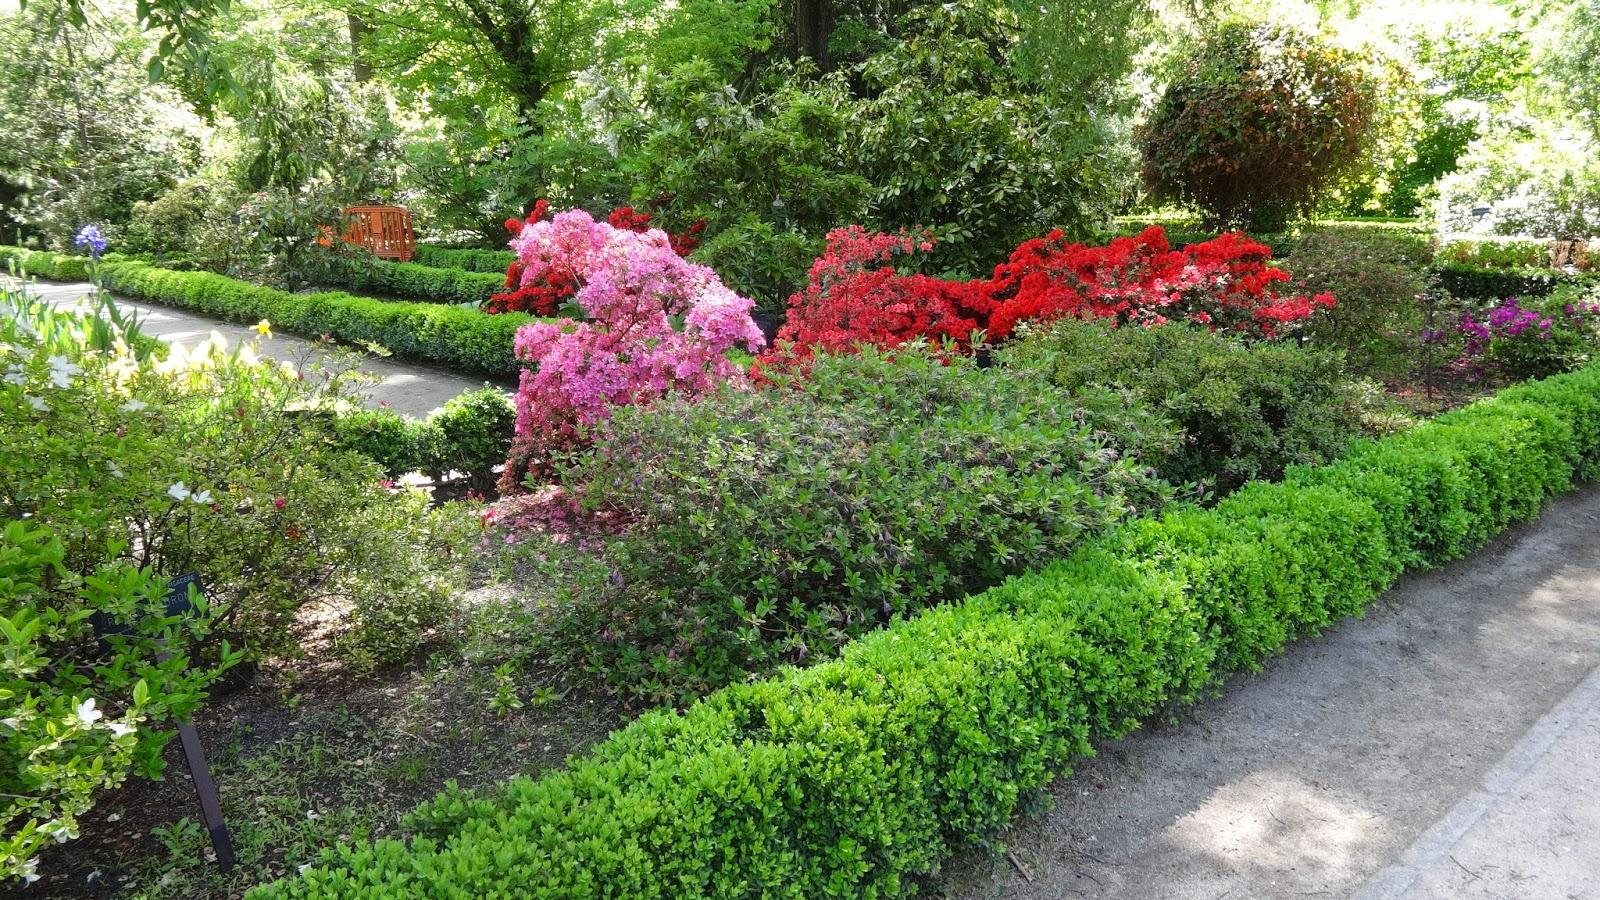 Jardin de plantas aromaticas jardin vertical de hierbas - Jardin de aromaticas ...